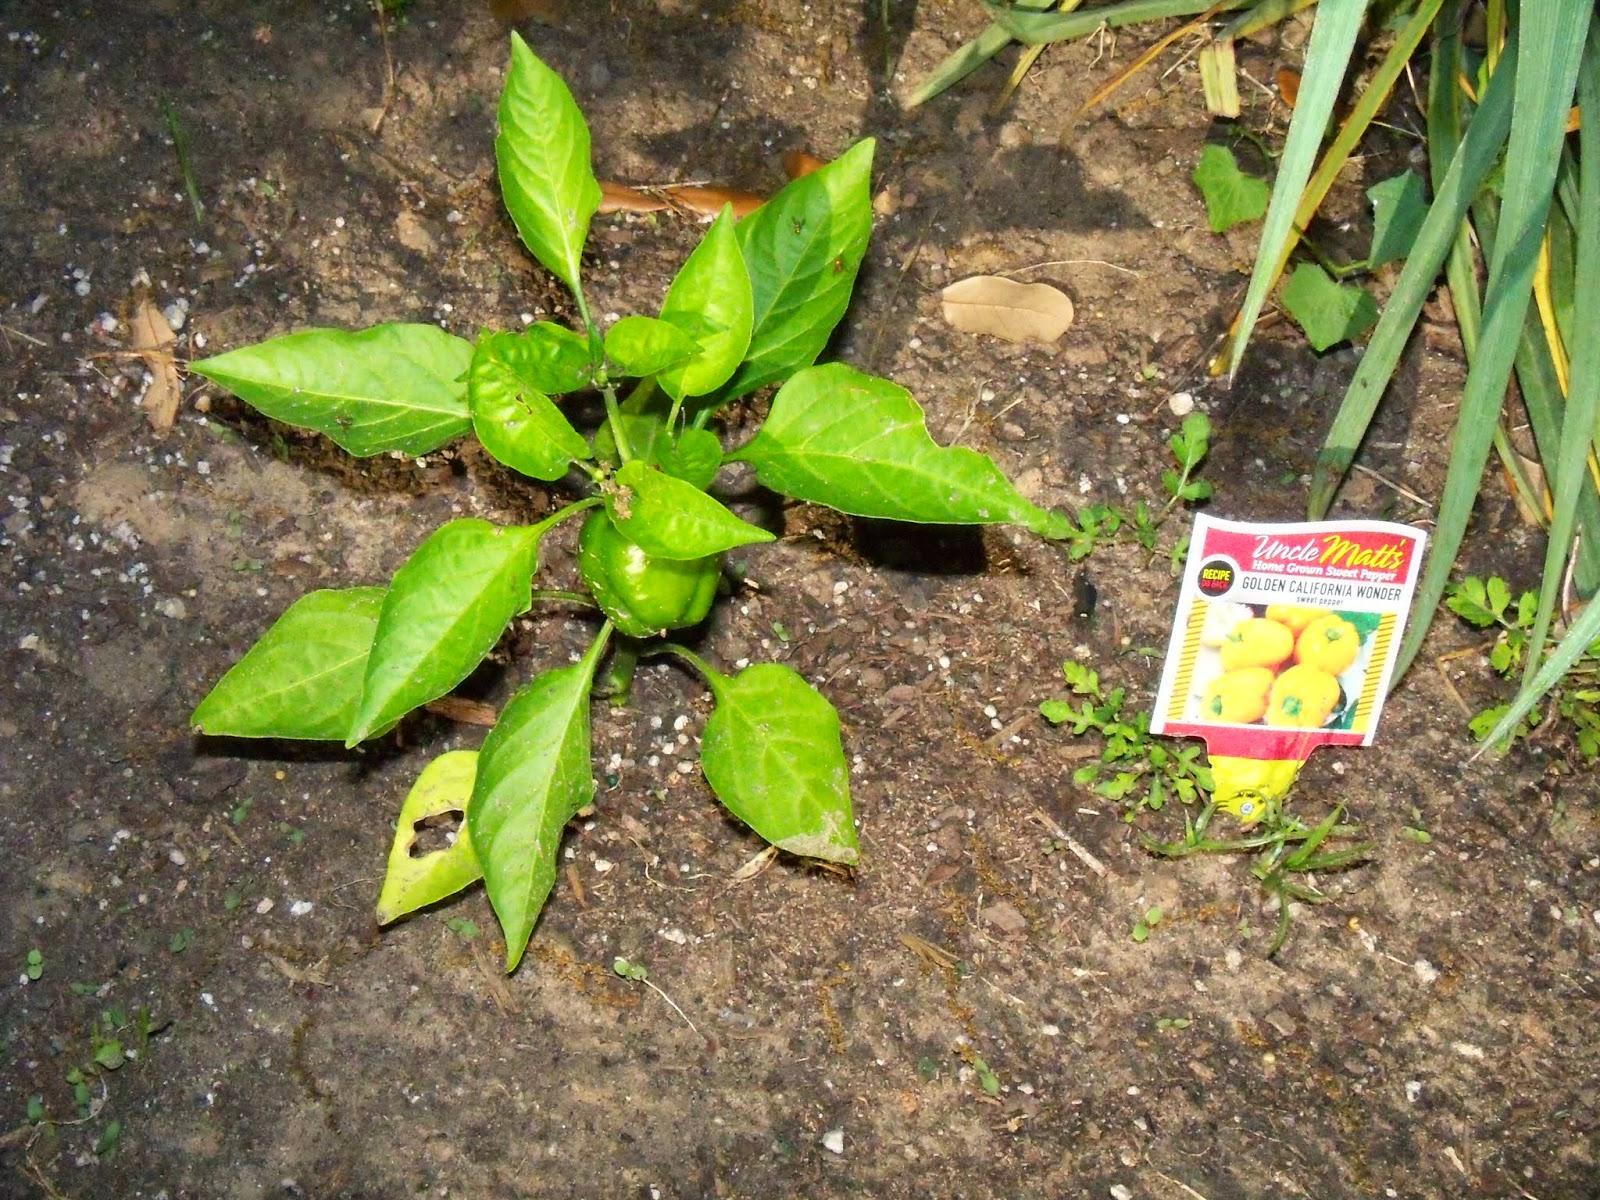 Gardening 2015 - 116_7679.JPG